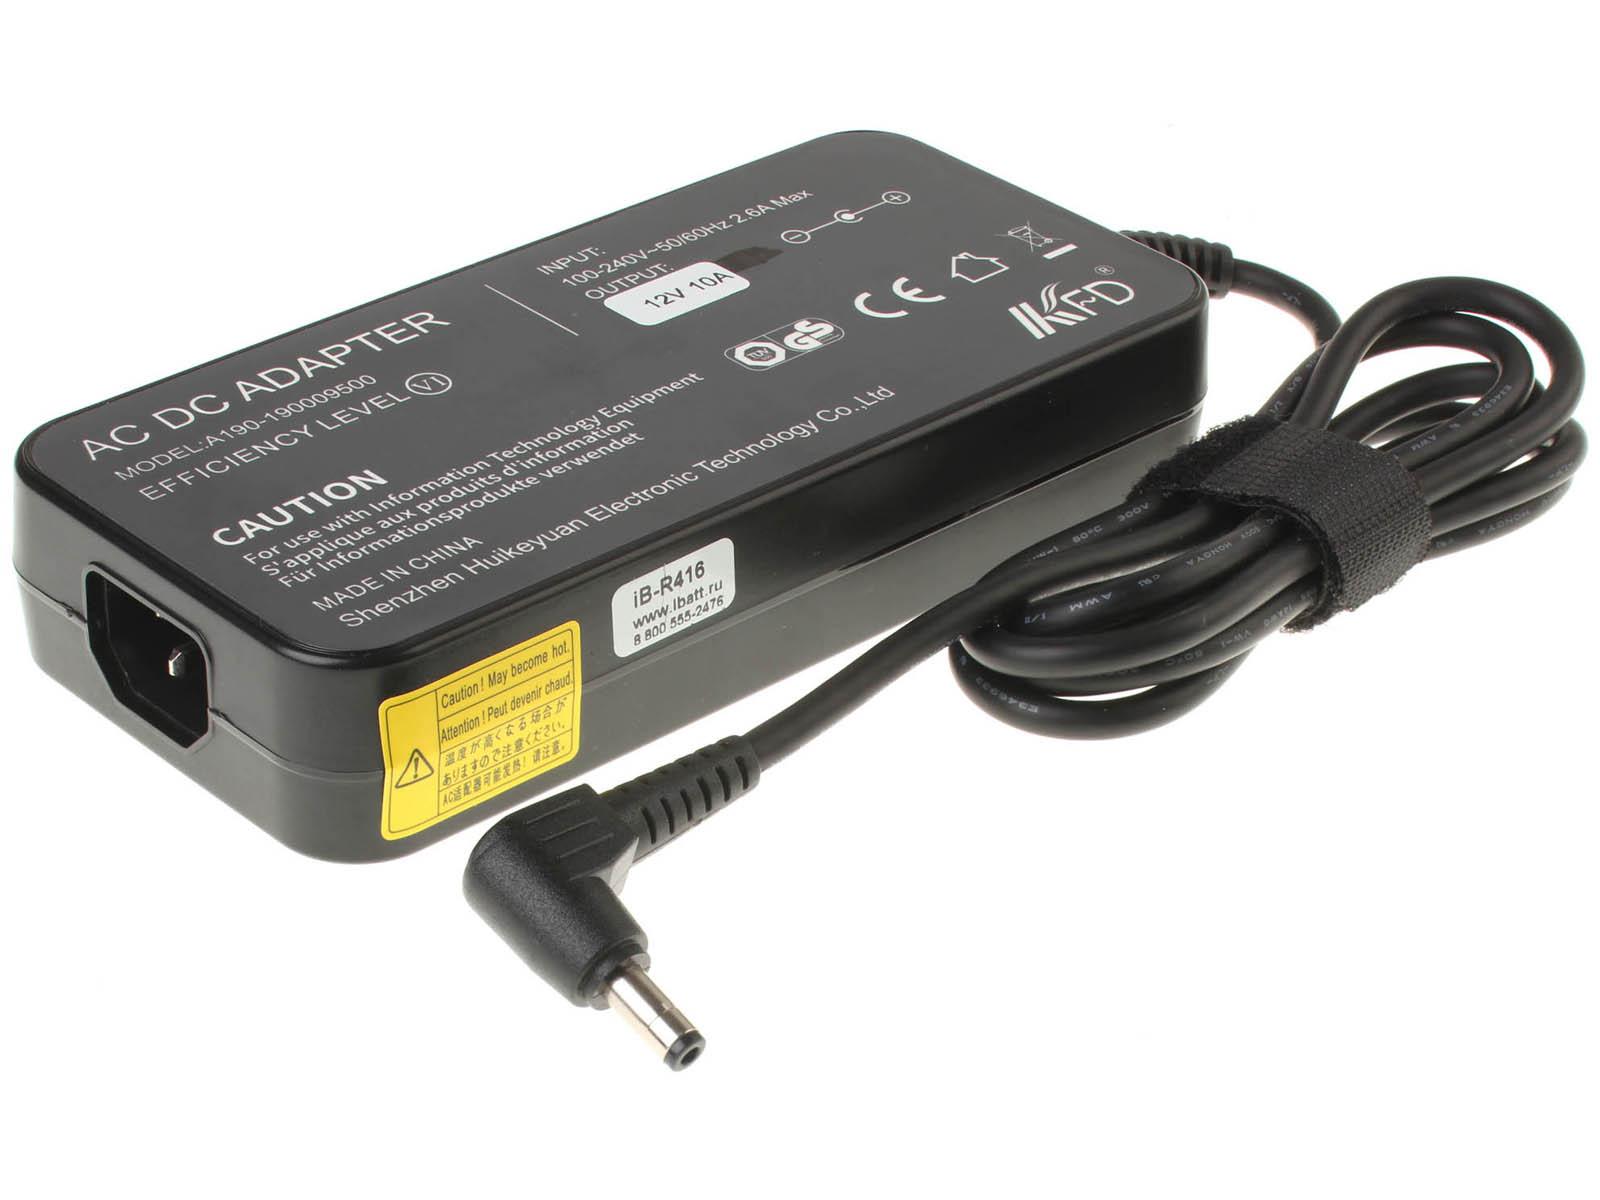 Блок питания (адаптер питания) JY071260U для ноутбука LG. Артикул iB-R416. Напряжение (V): 12